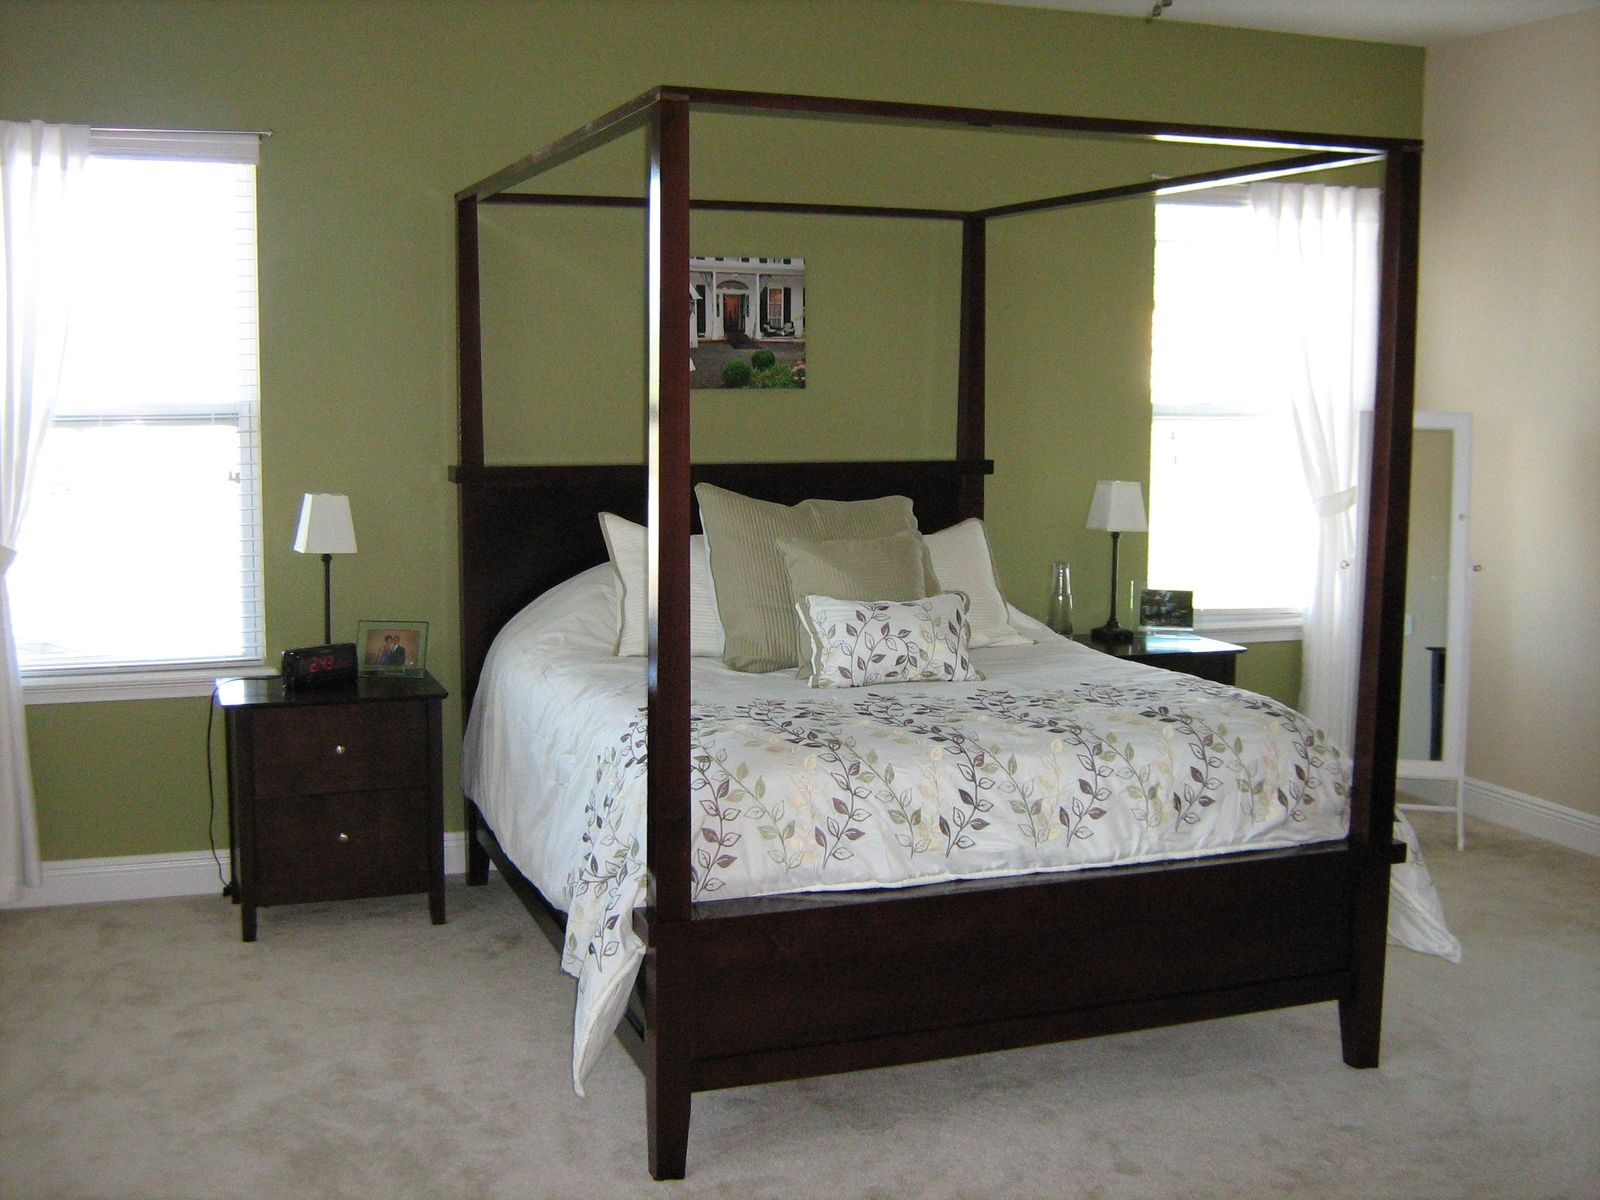 Custom Canopy Bed custom made canopy beddon laporte fine woodworking